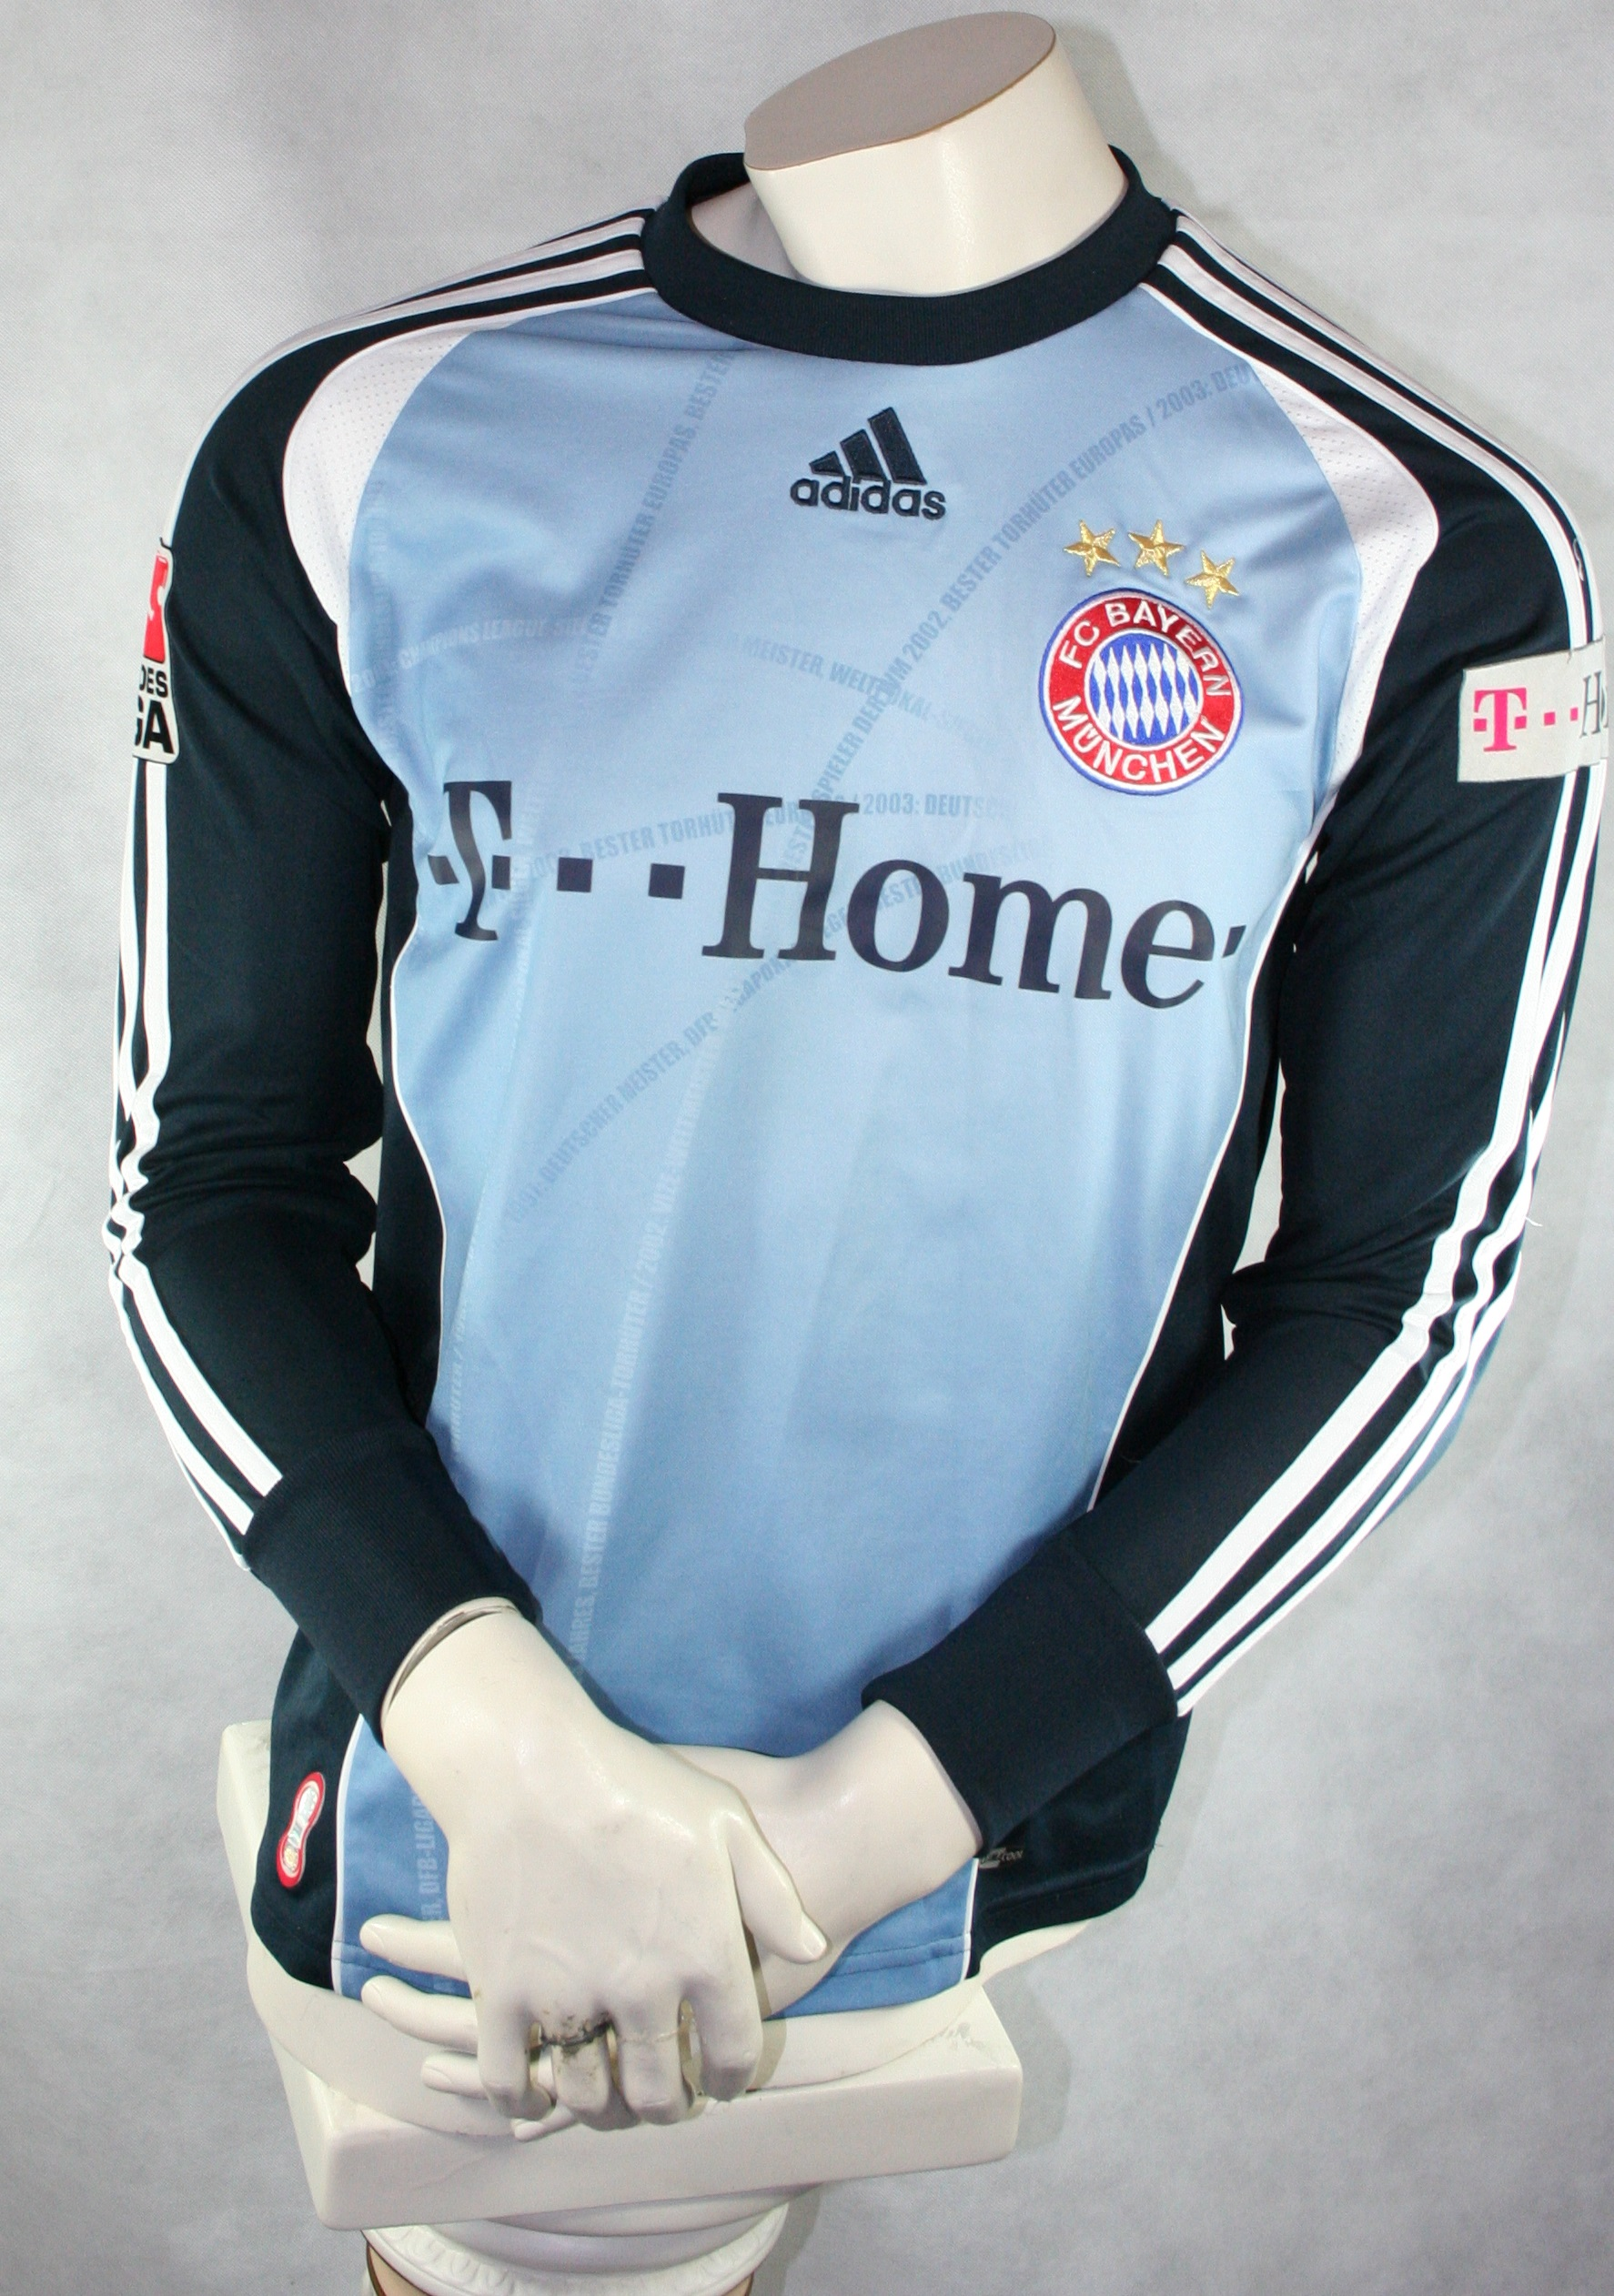 FC Bayern München Adidas Torwarttrikot Oliver Kahn Größe M NEU Vintage Trikot Fußball